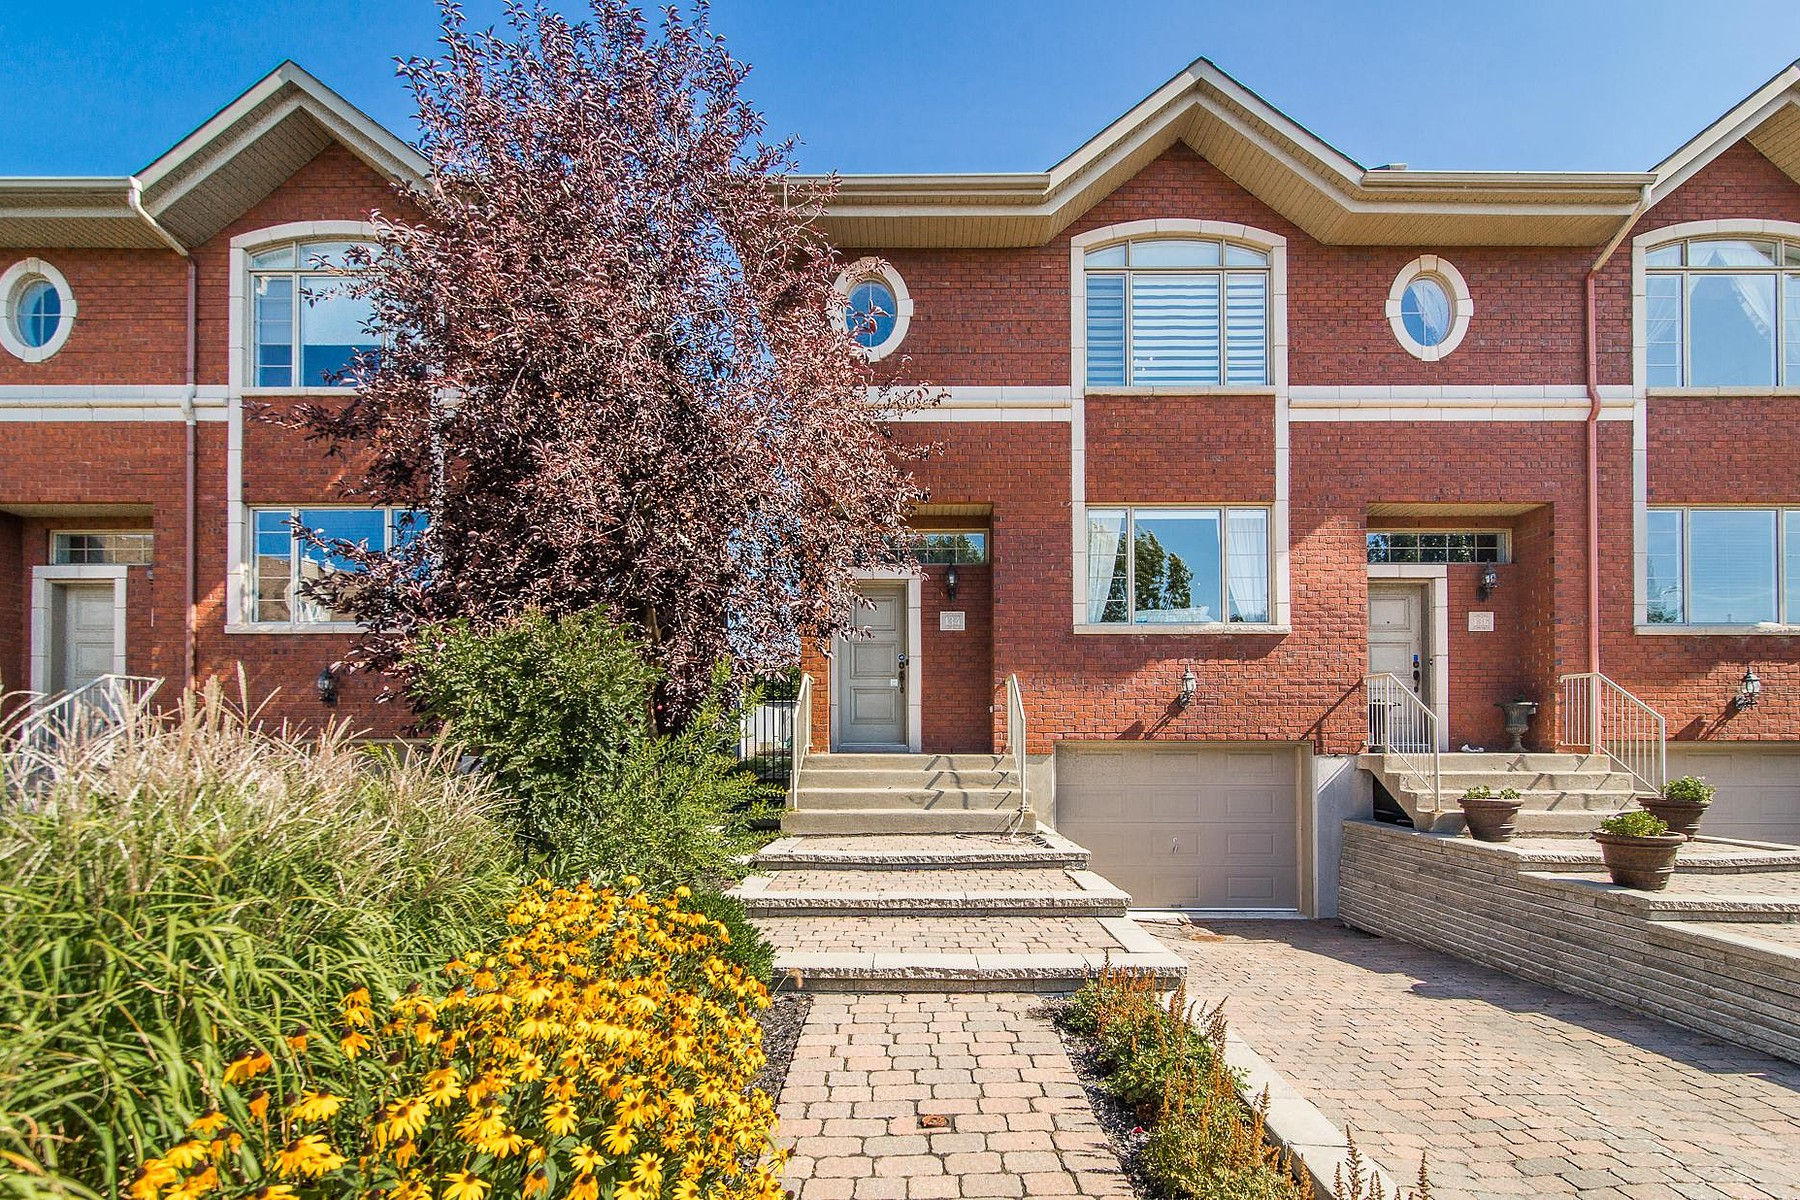 Villa per Vendita alle ore Saint-Lambert, Montérégie 134 Crois. Achin Saint-Lambert, Quebec J4R2V1 Canada